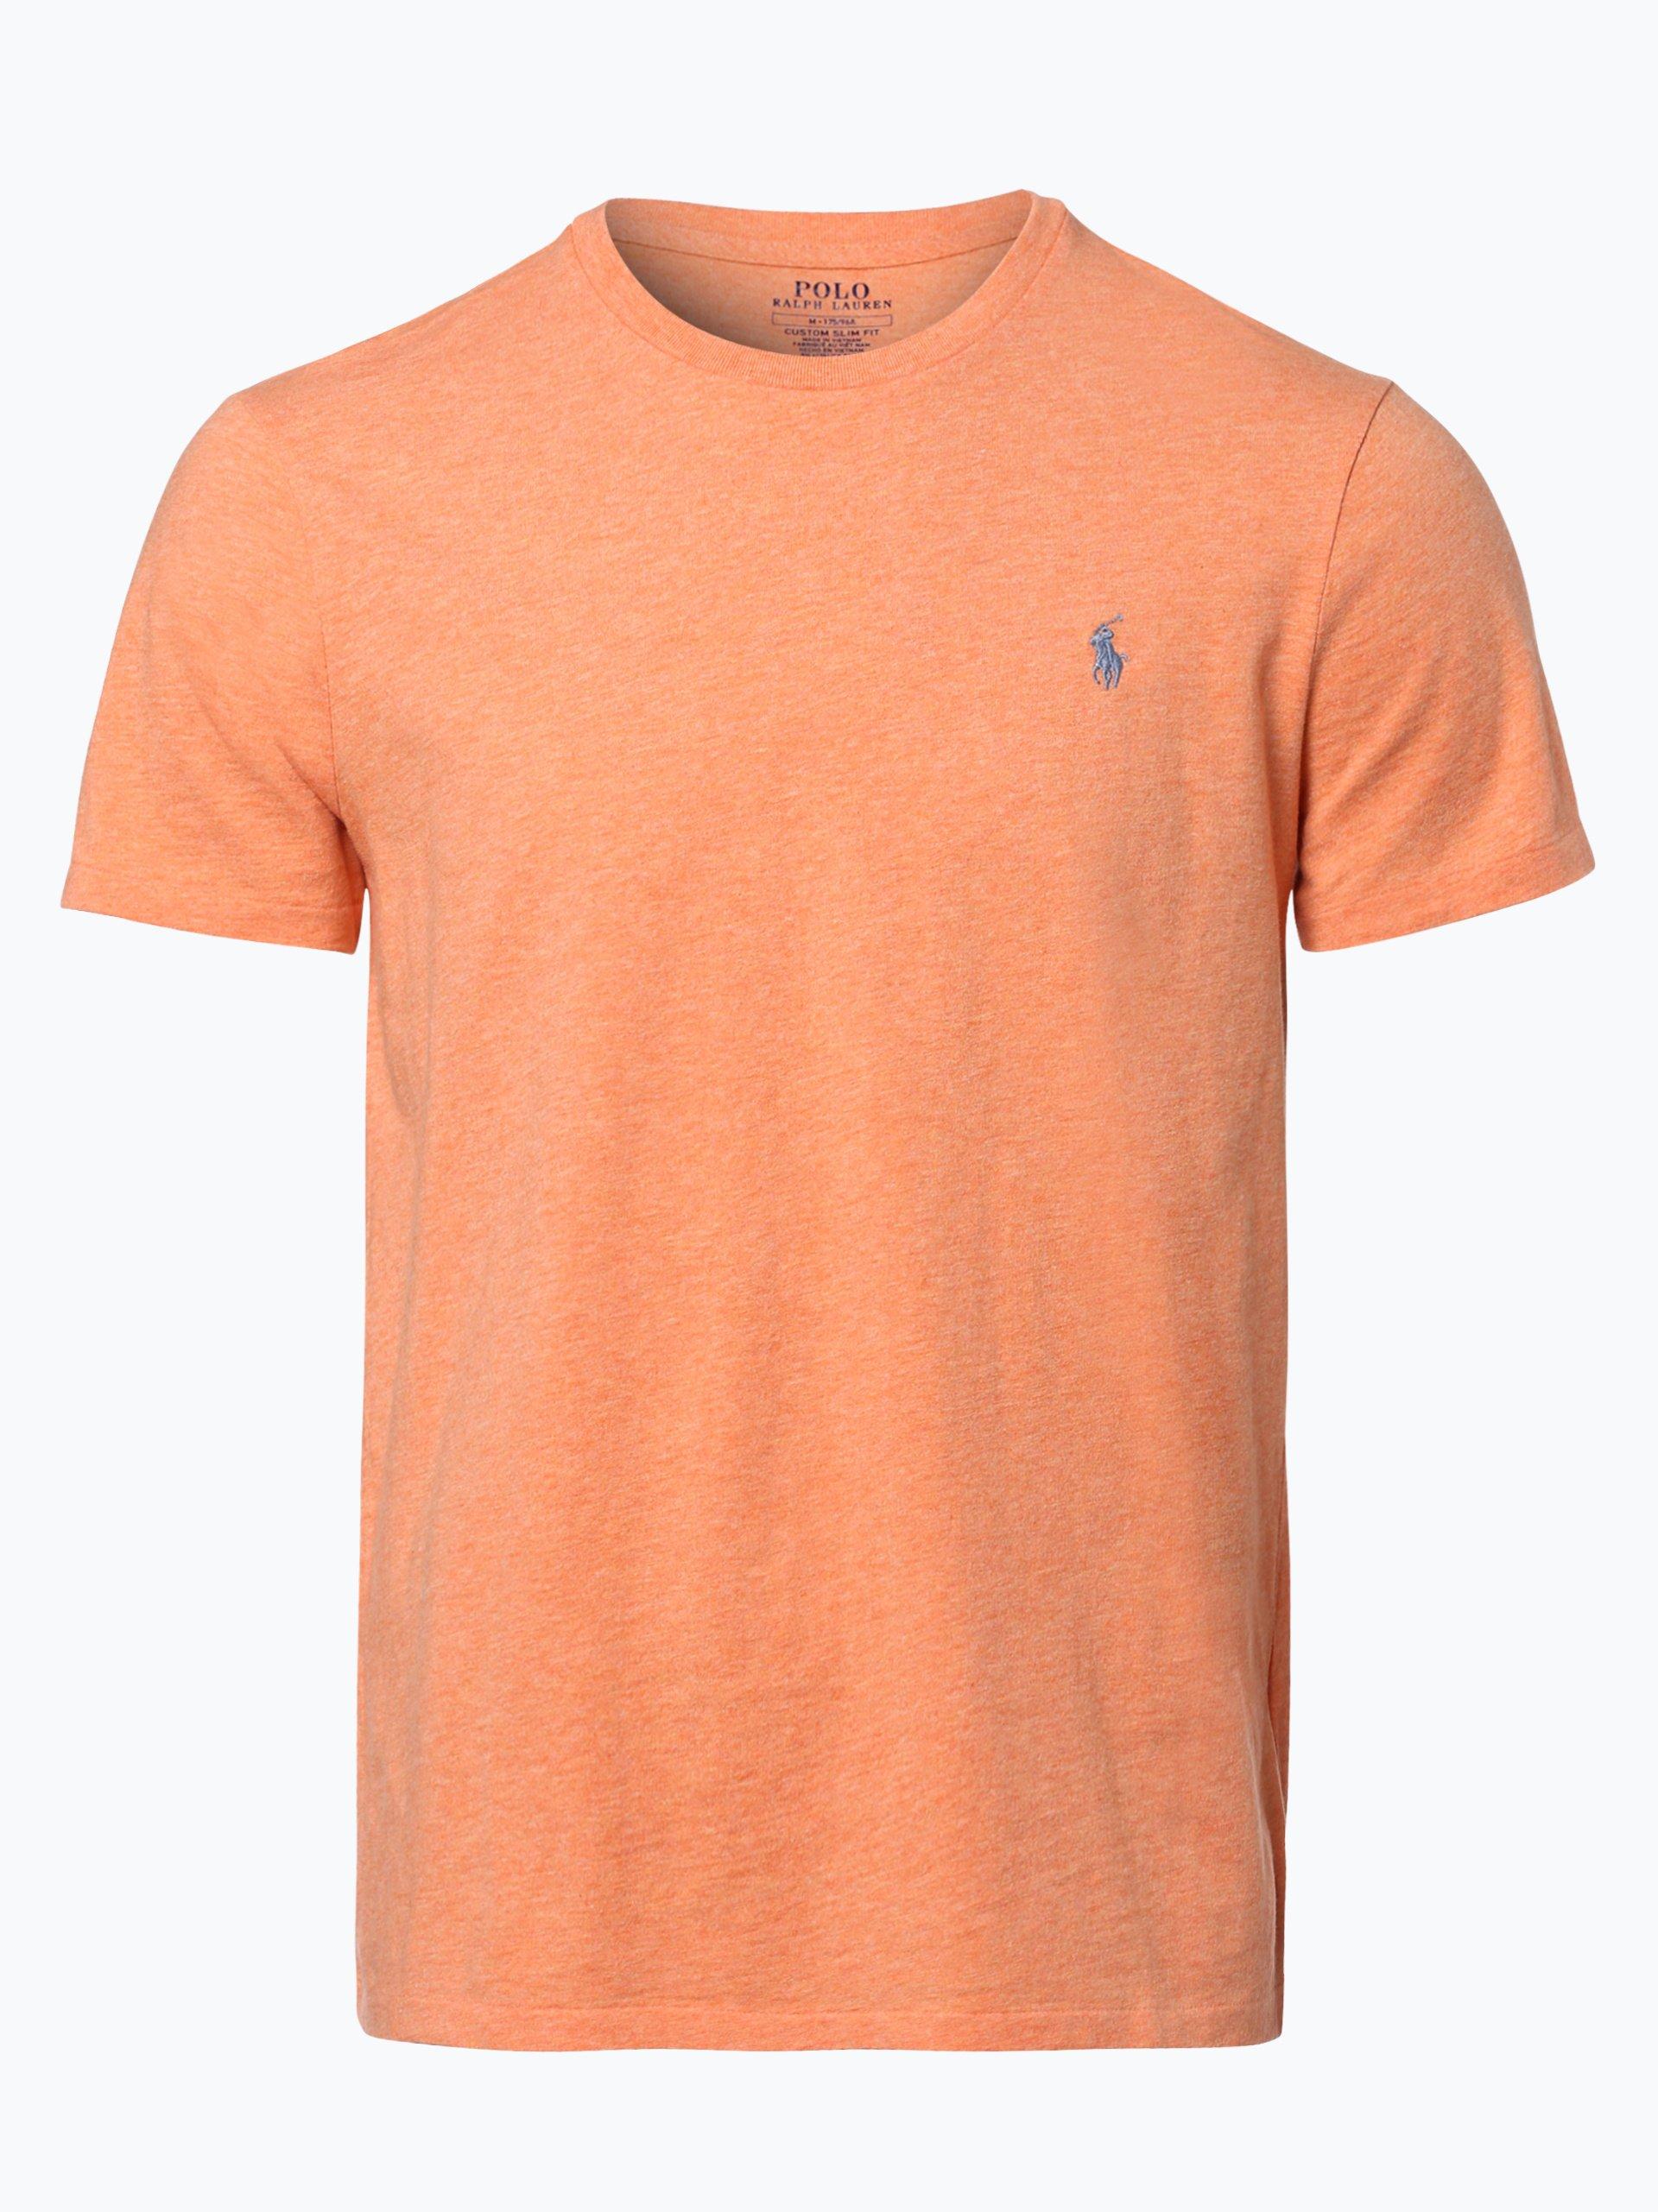 polo ralph lauren herren t shirt orange meliert online kaufen peek und cloppenburg de. Black Bedroom Furniture Sets. Home Design Ideas